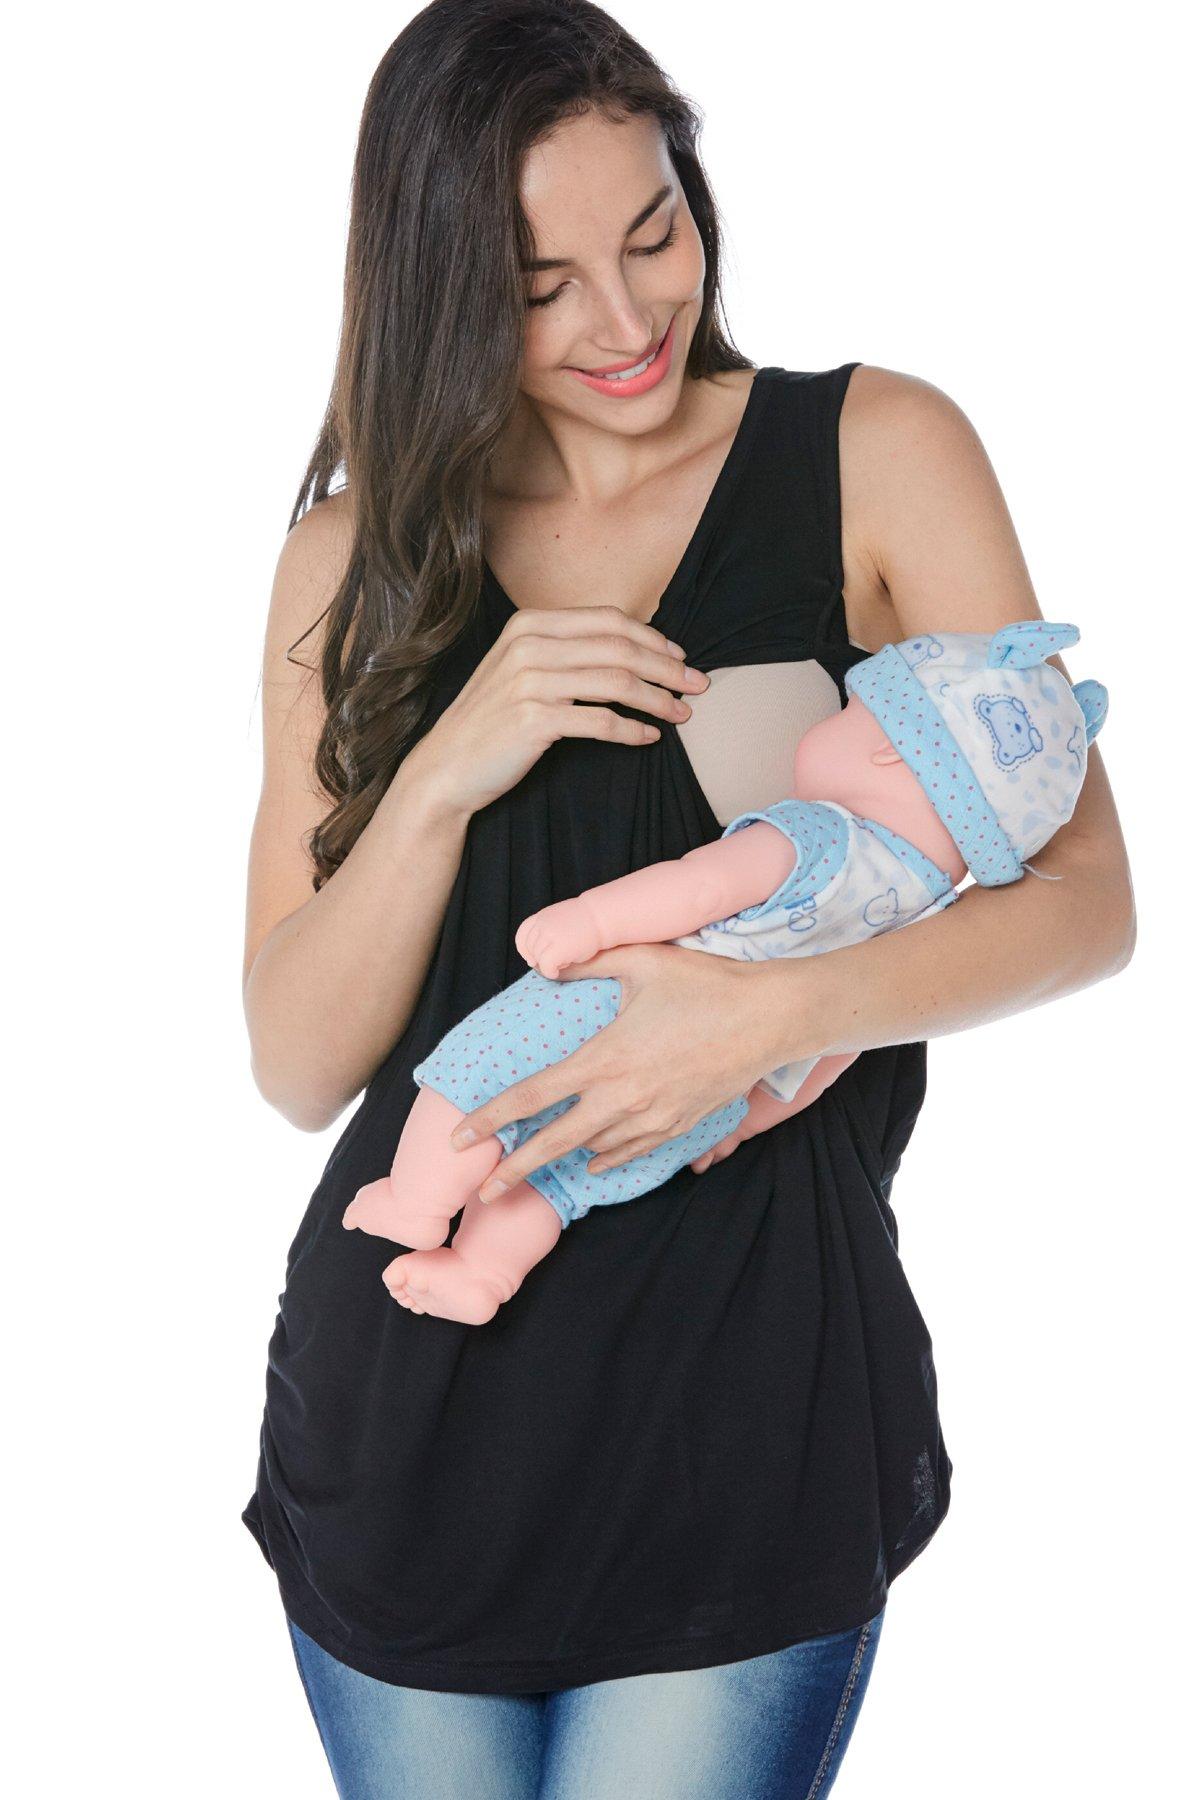 Smallshow Women's Maternity Nursing Tank Top Sleeveless Comfy Breastfeeding Clothes,Black,Medium